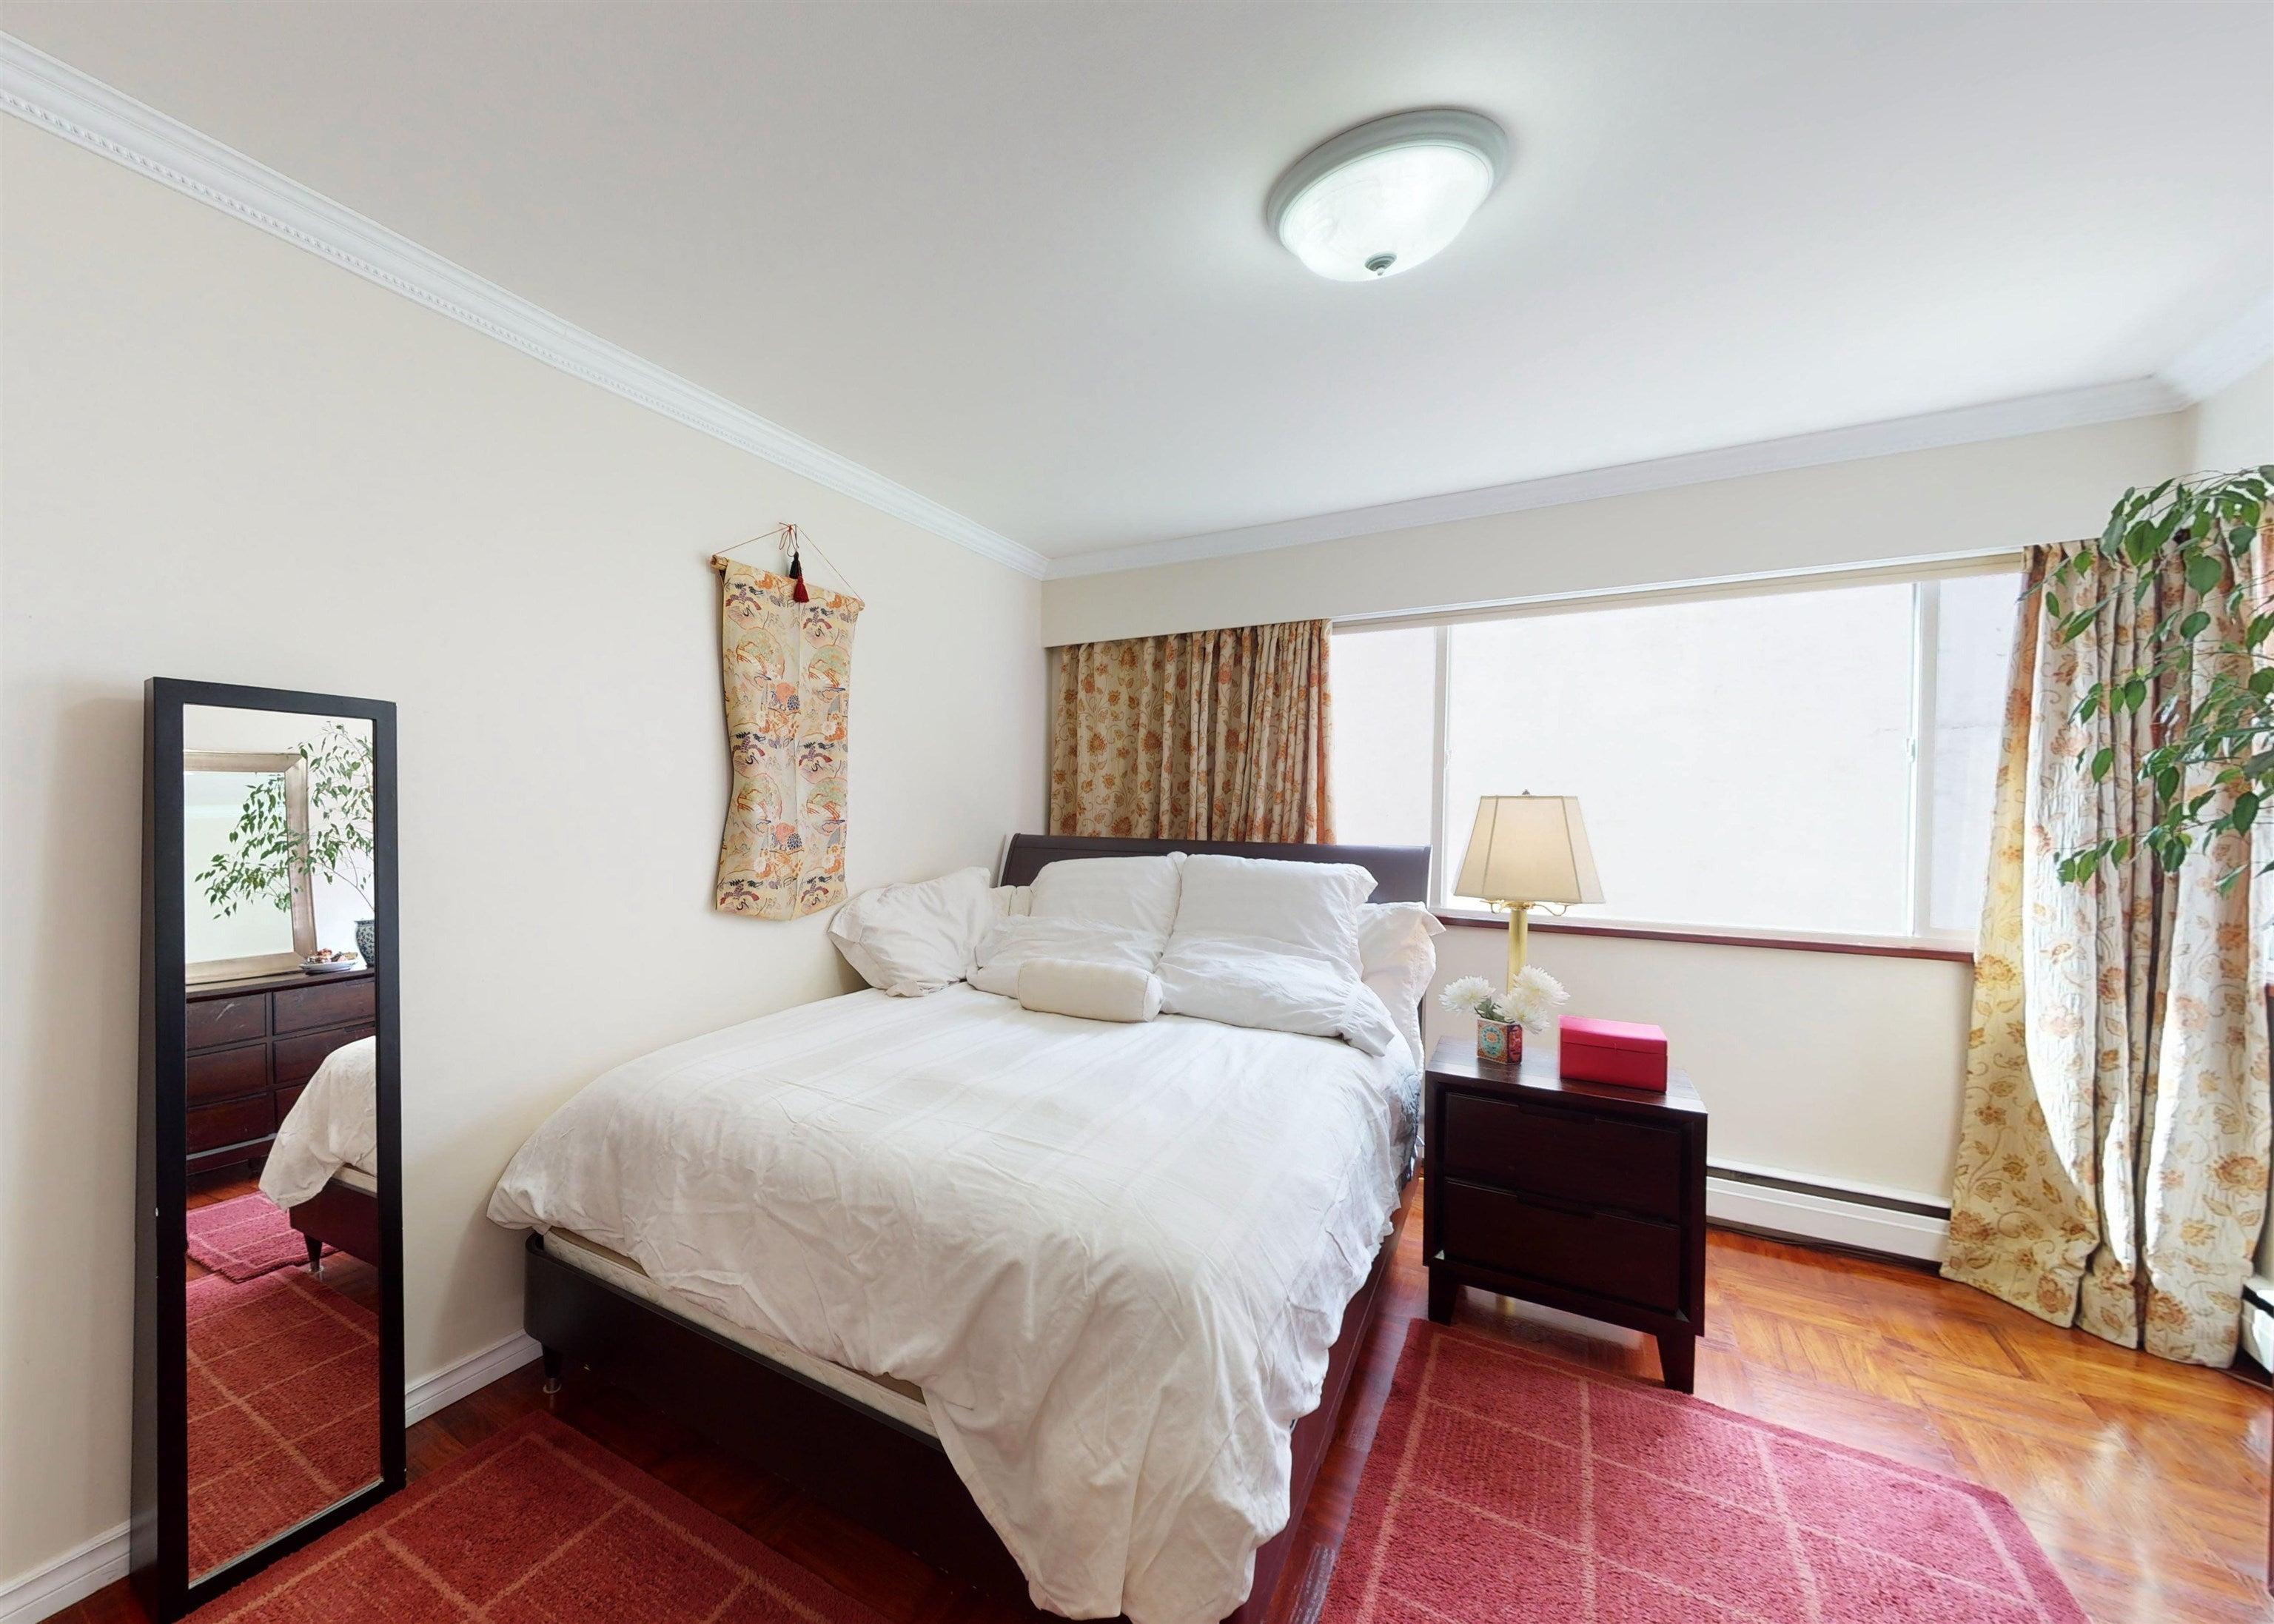 202 1750 ESQUIMALT AVENUE - Ambleside Apartment/Condo for sale, 1 Bedroom (R2610188) - #14